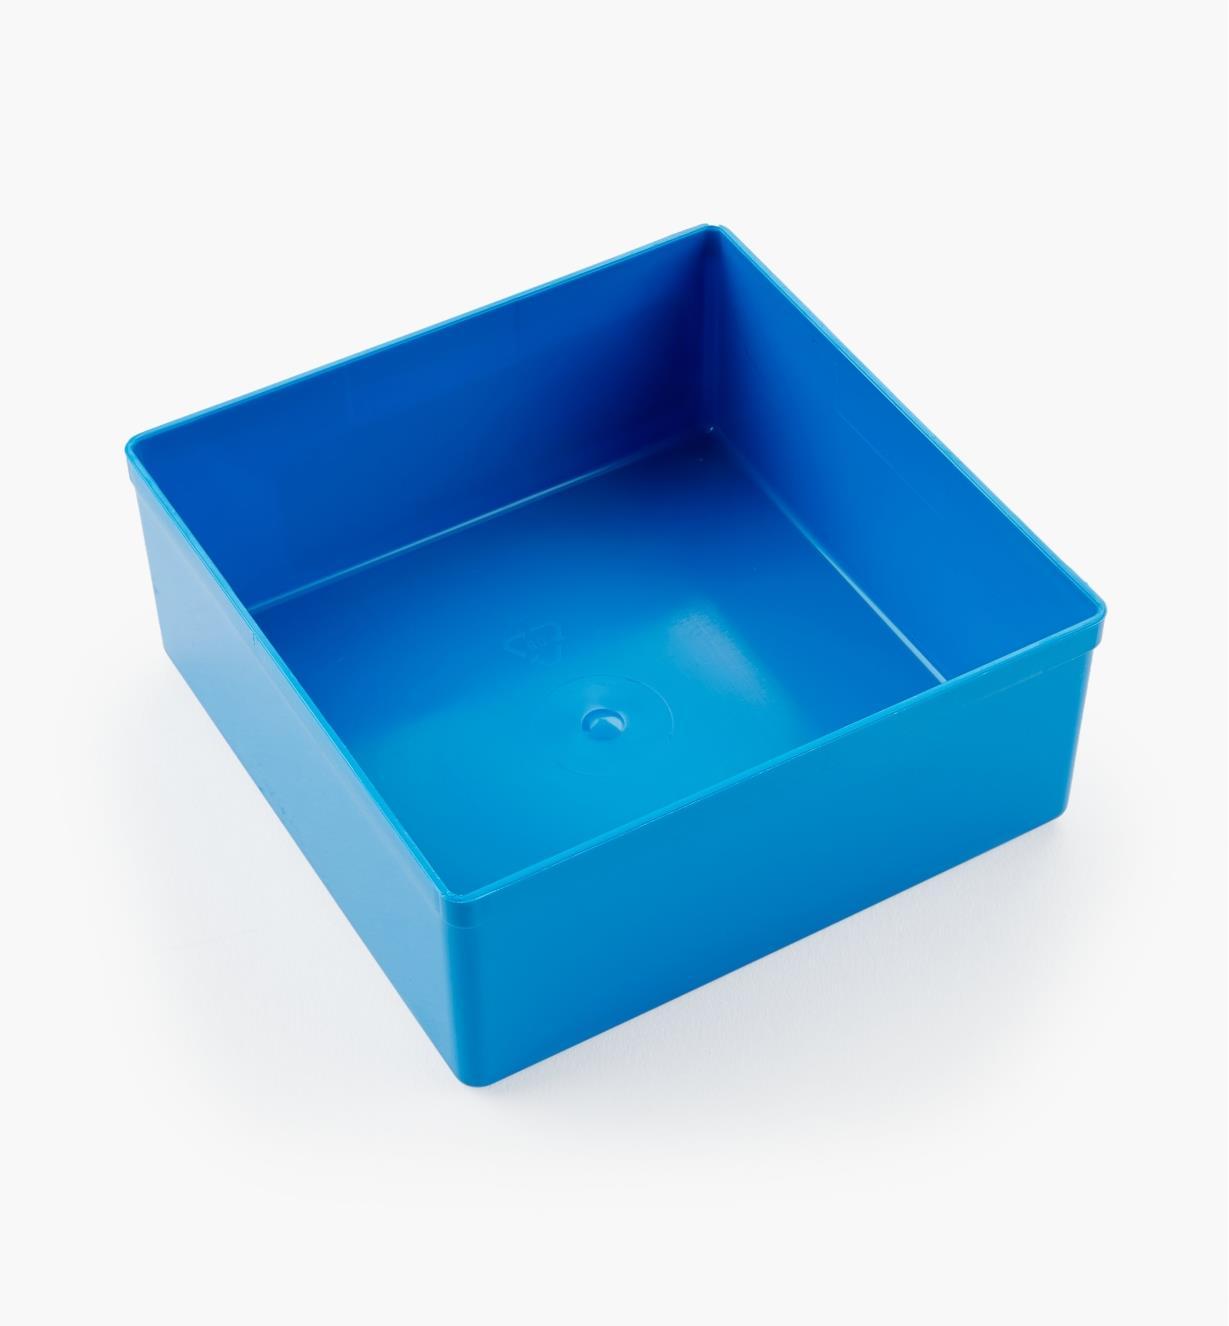 27K8013 - Godet bleu de 43 mm x 105 mm x 105 mm (1 11/16 po x 4 1/8 po x 4 1/8 po), l'unité